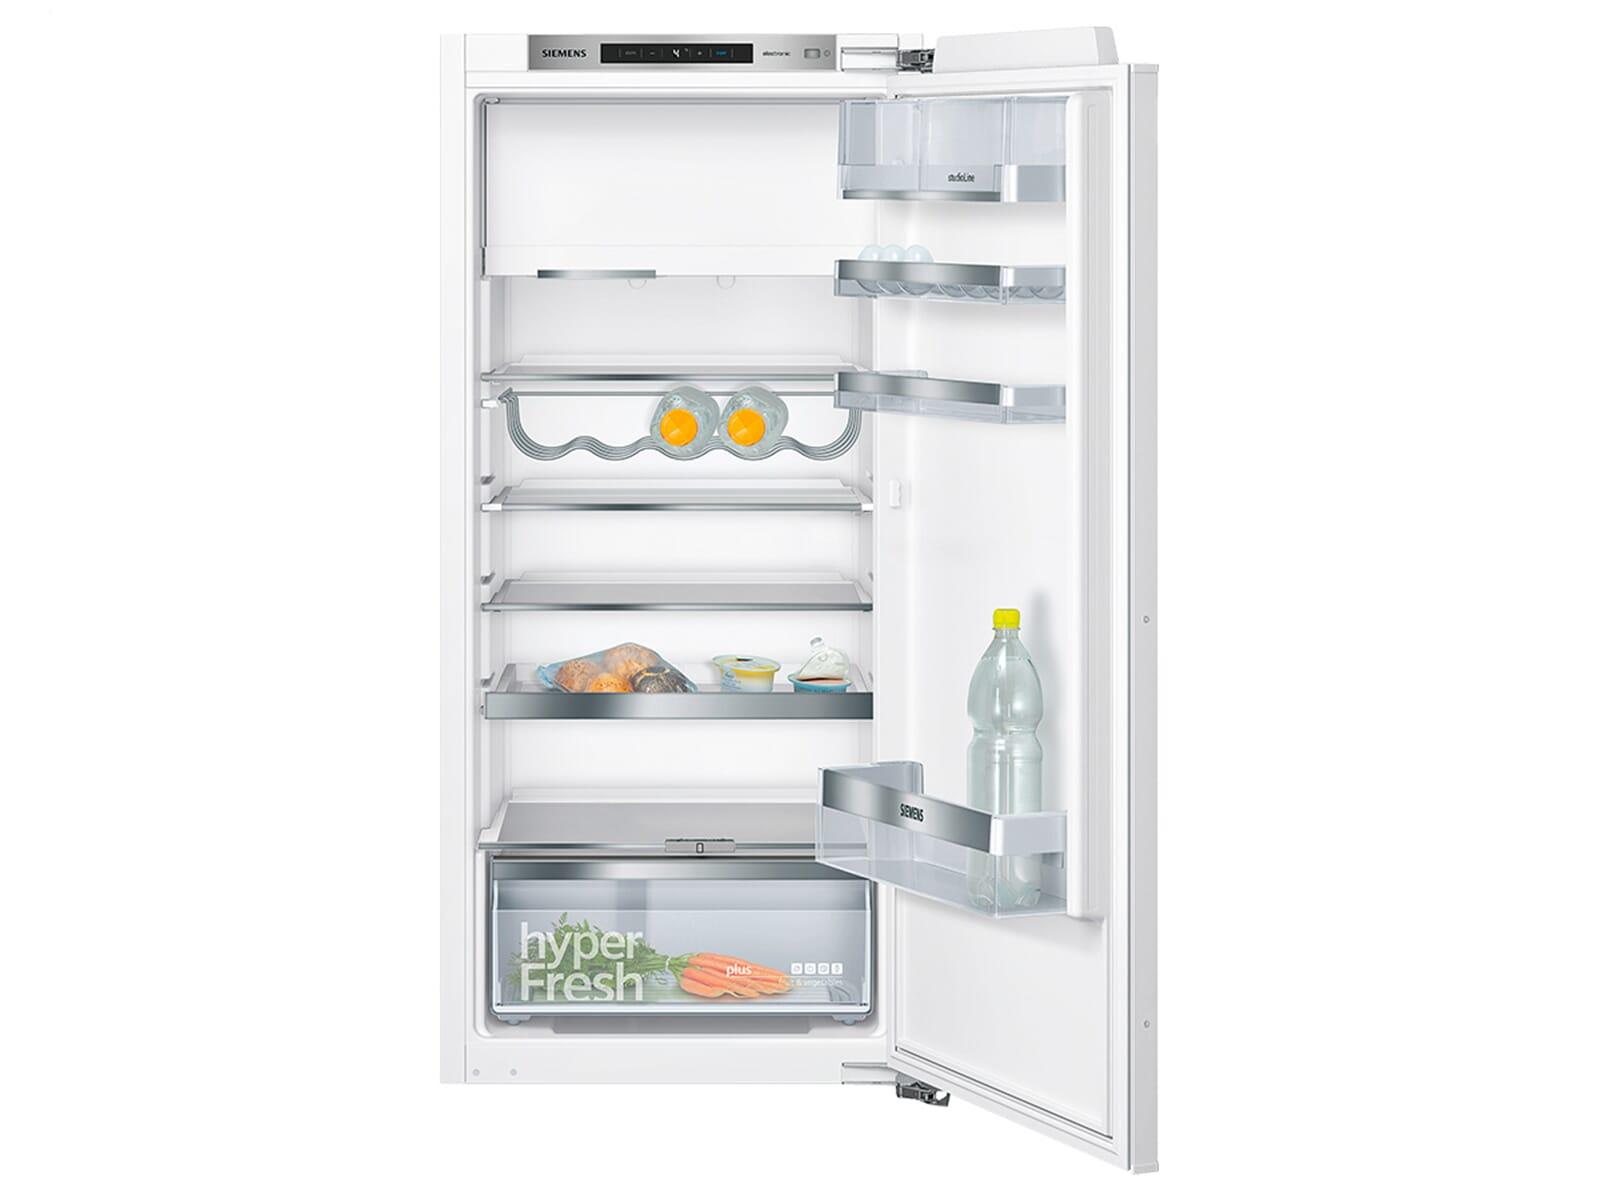 Siemens Kühlschrank Hyperfresh : Siemens studioline ki lsd einbaukühlschrank